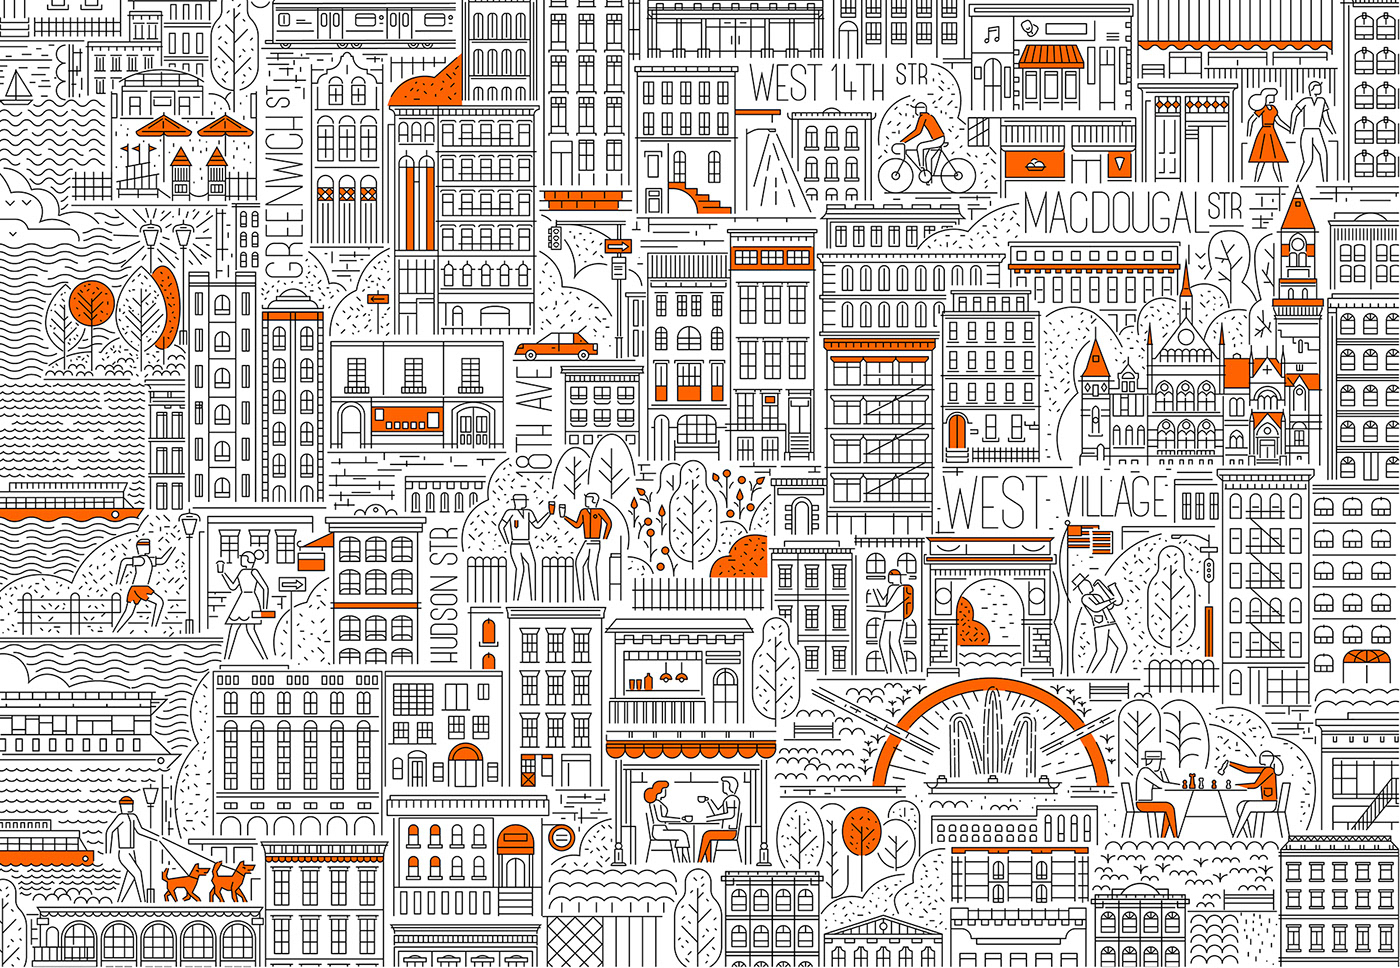 Playful Illustrations of Manhattan